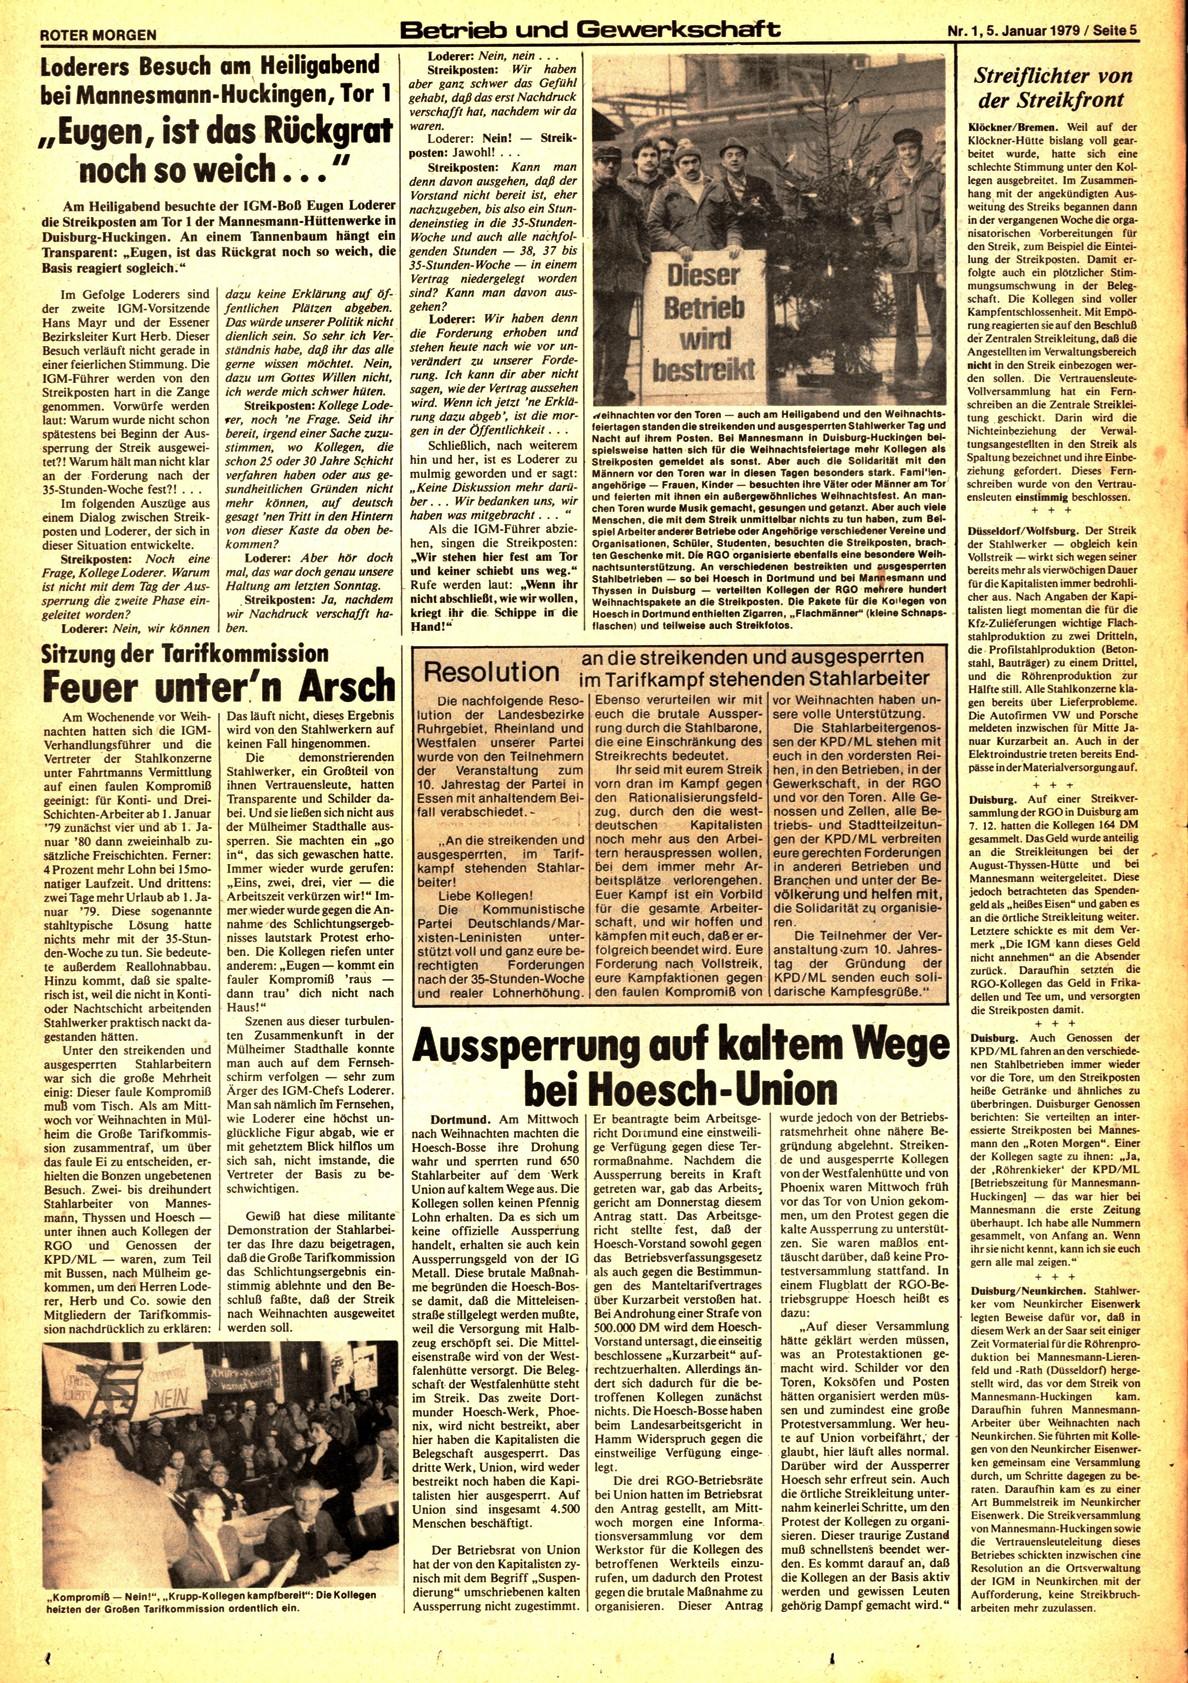 Roter Morgen, 13. Jg., 5. Januar 1979, Nr. 1, Seite 5